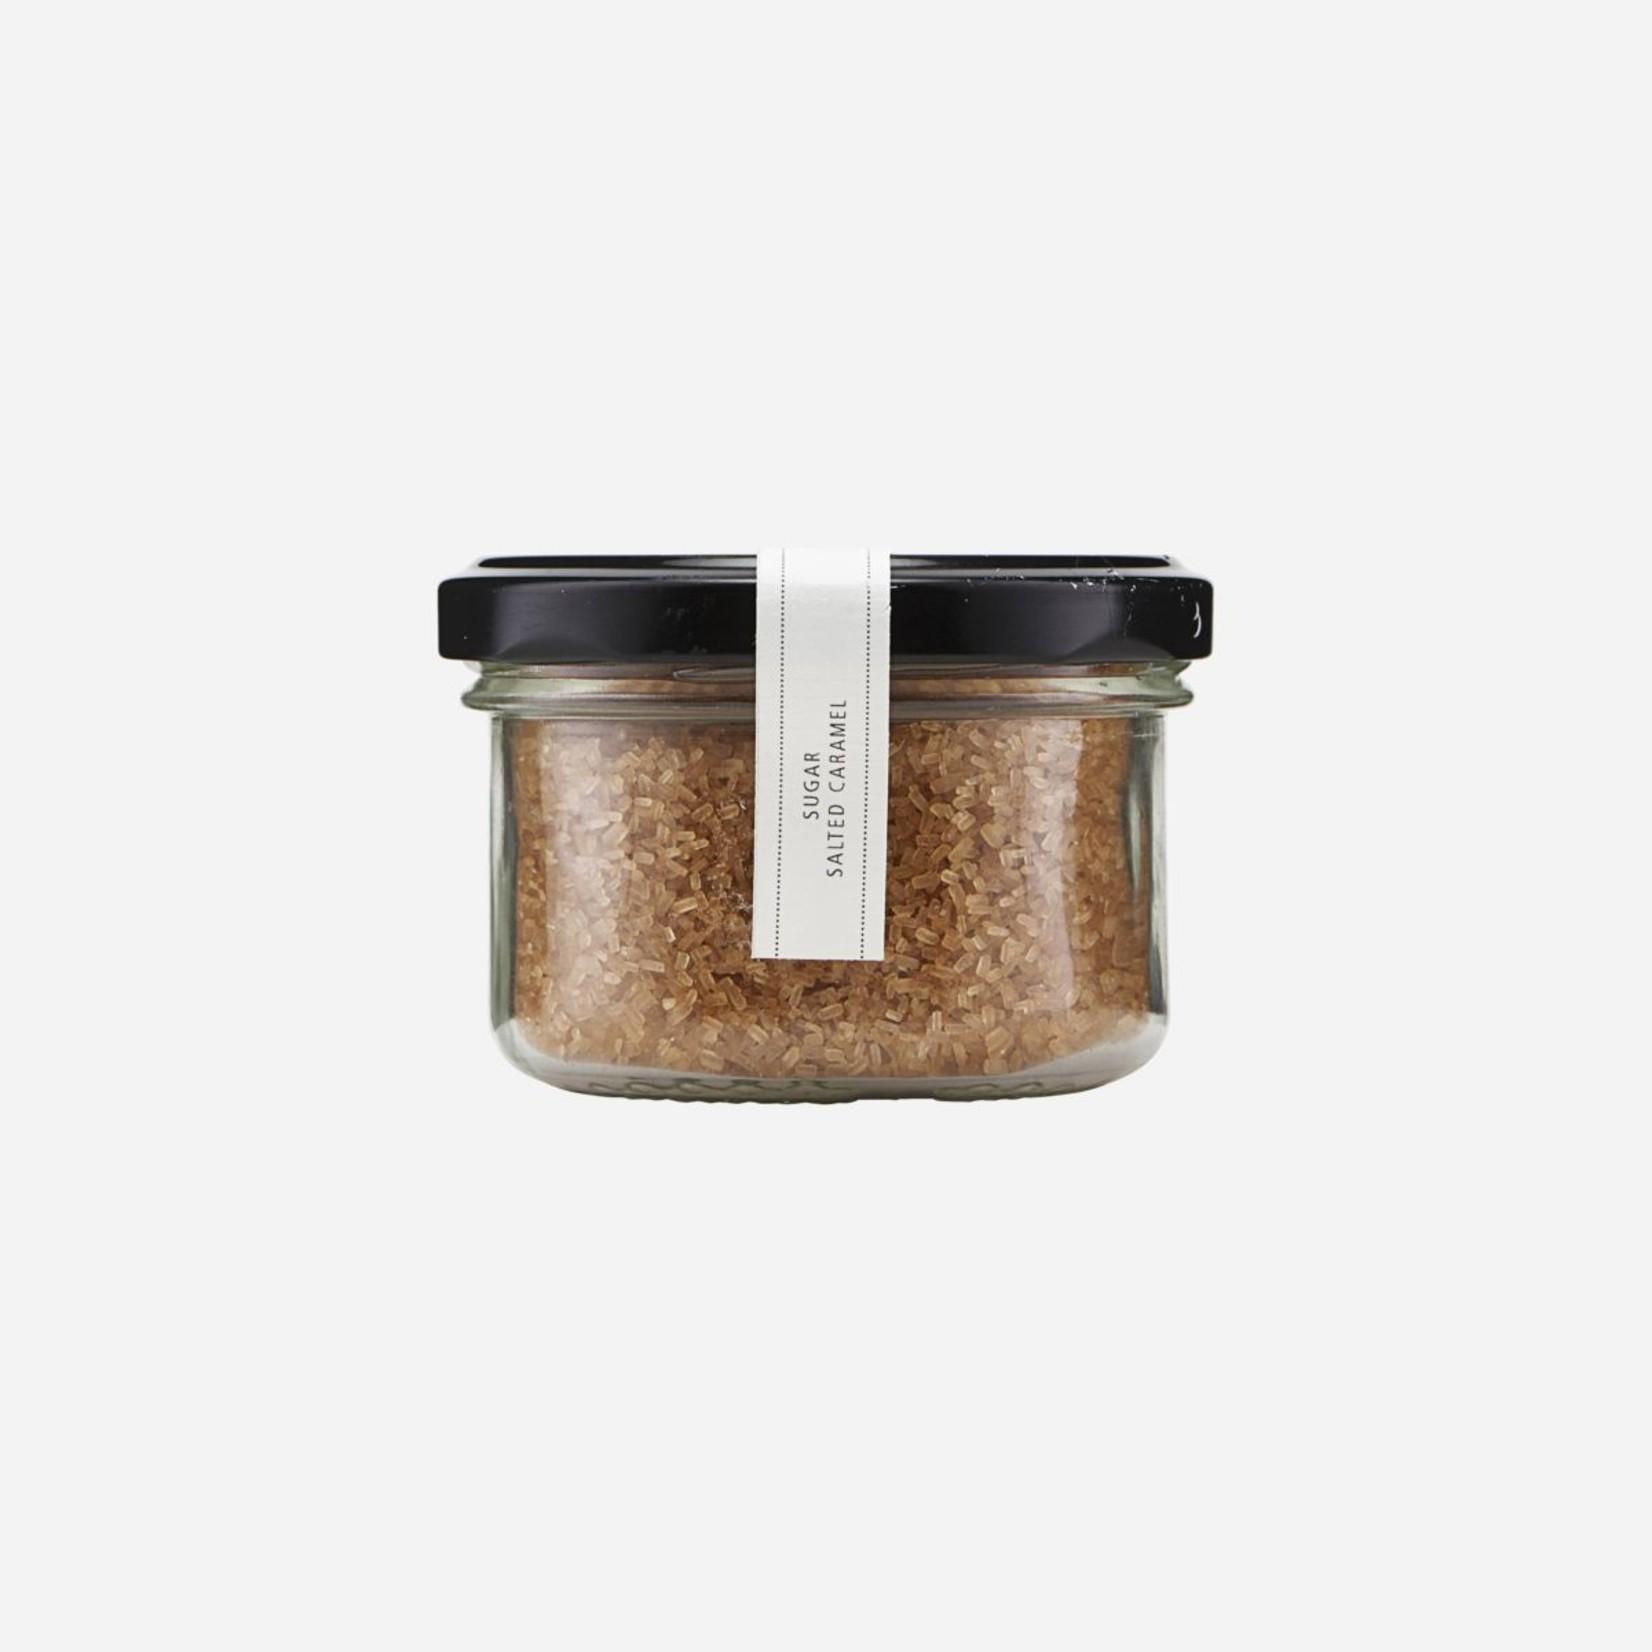 Nicolas Vahé Zucker Salt Caramel